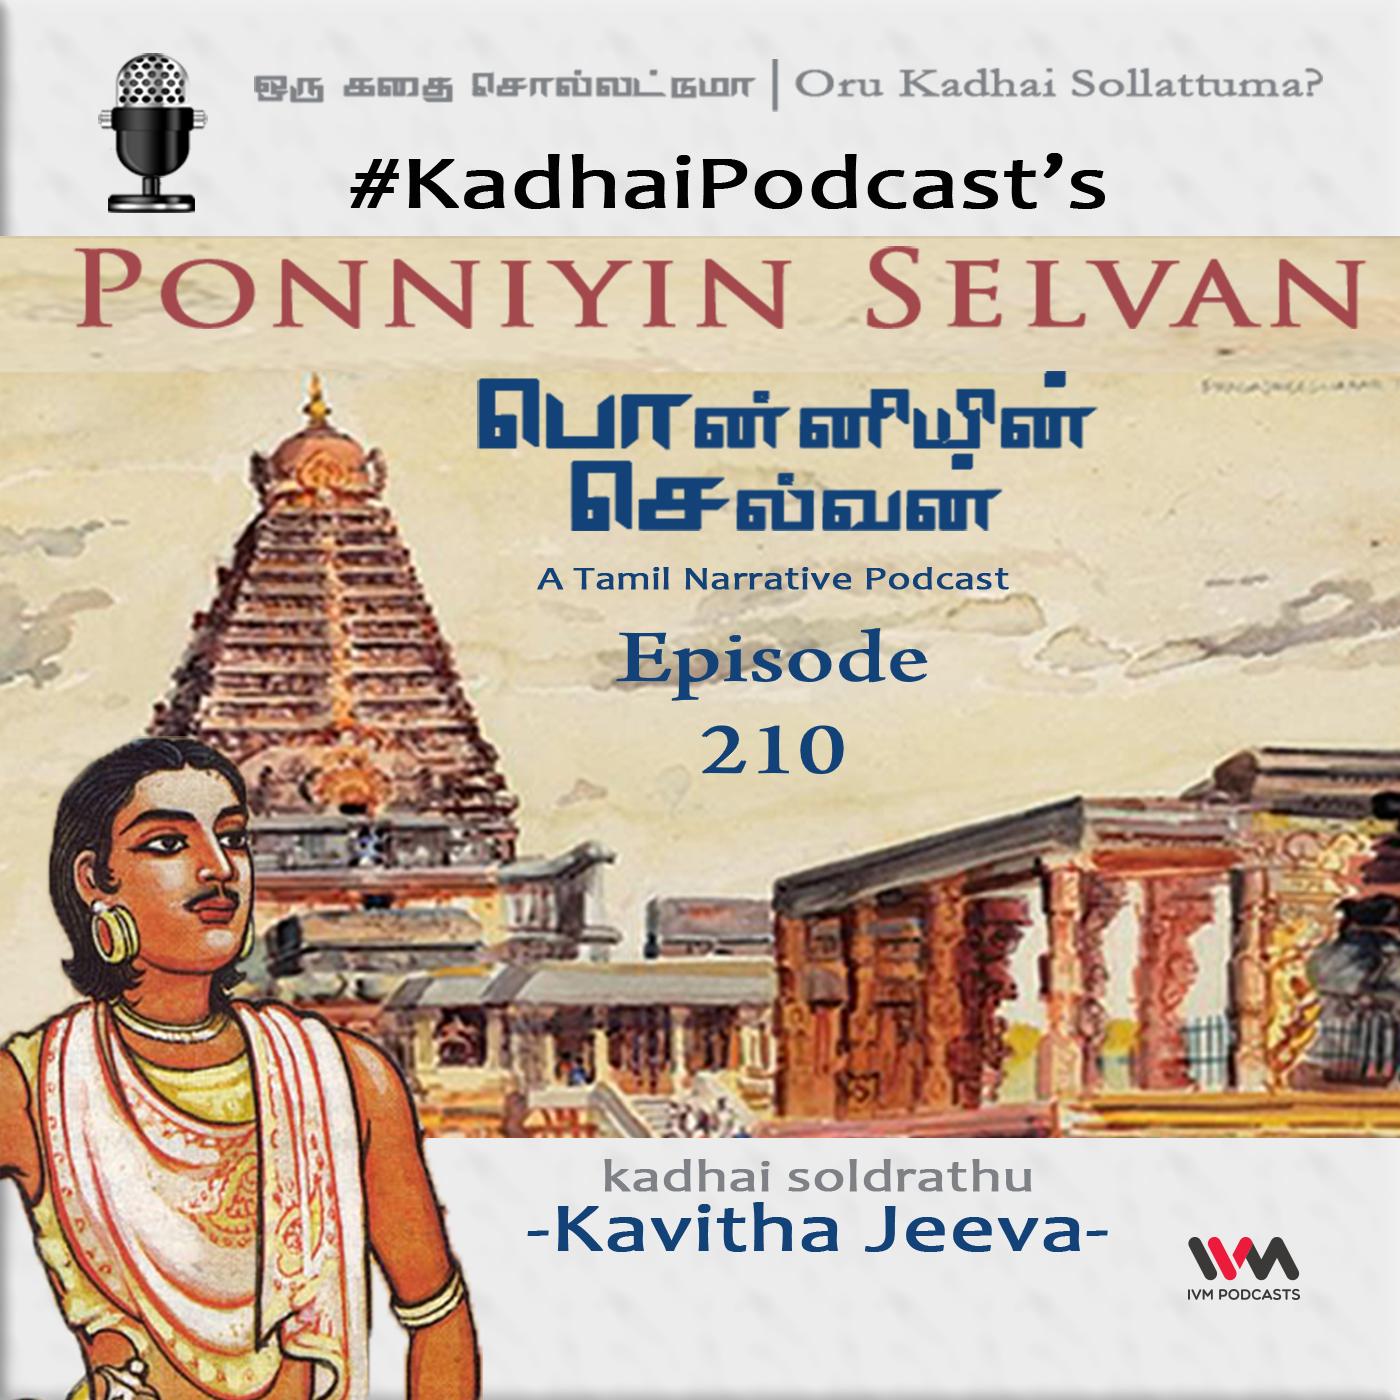 KadhaiPodcast's Ponniyin Selvan - Episode # 210